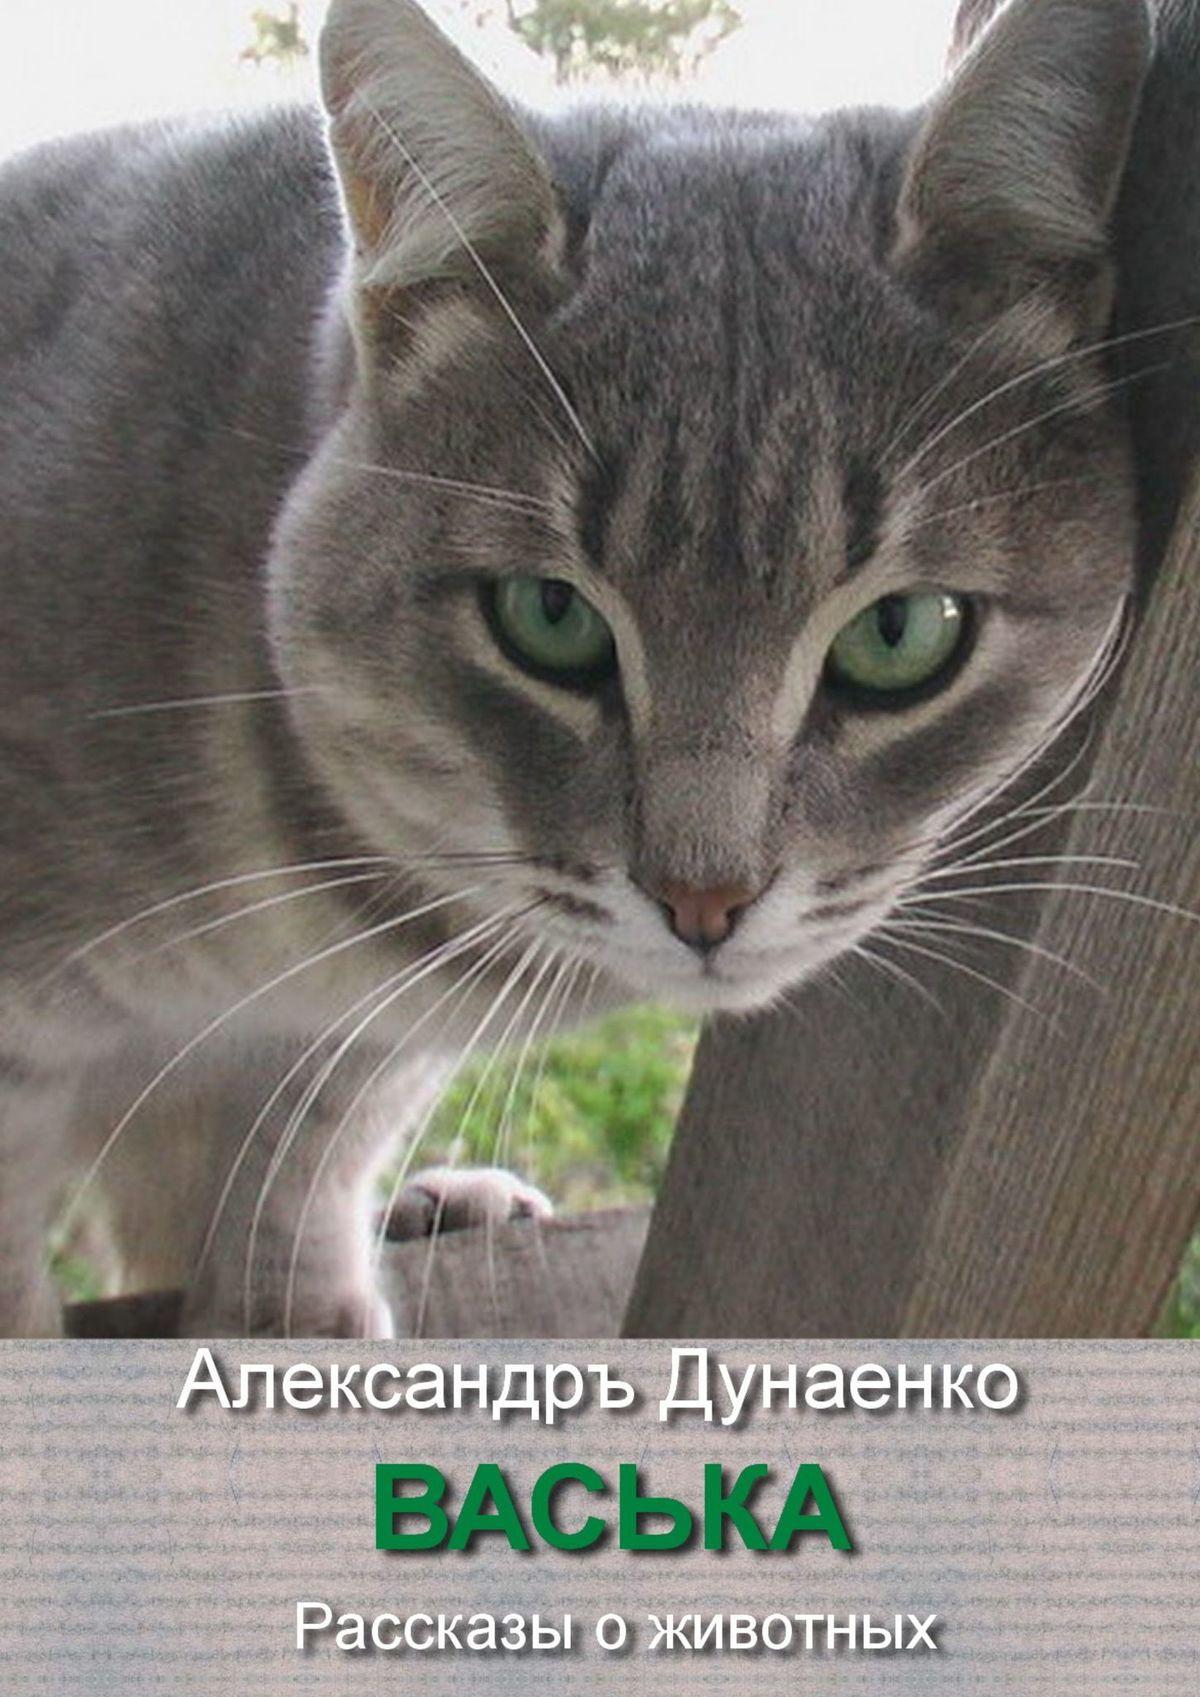 Александръ Дунаенко Васька. Рассказы оживотных цены